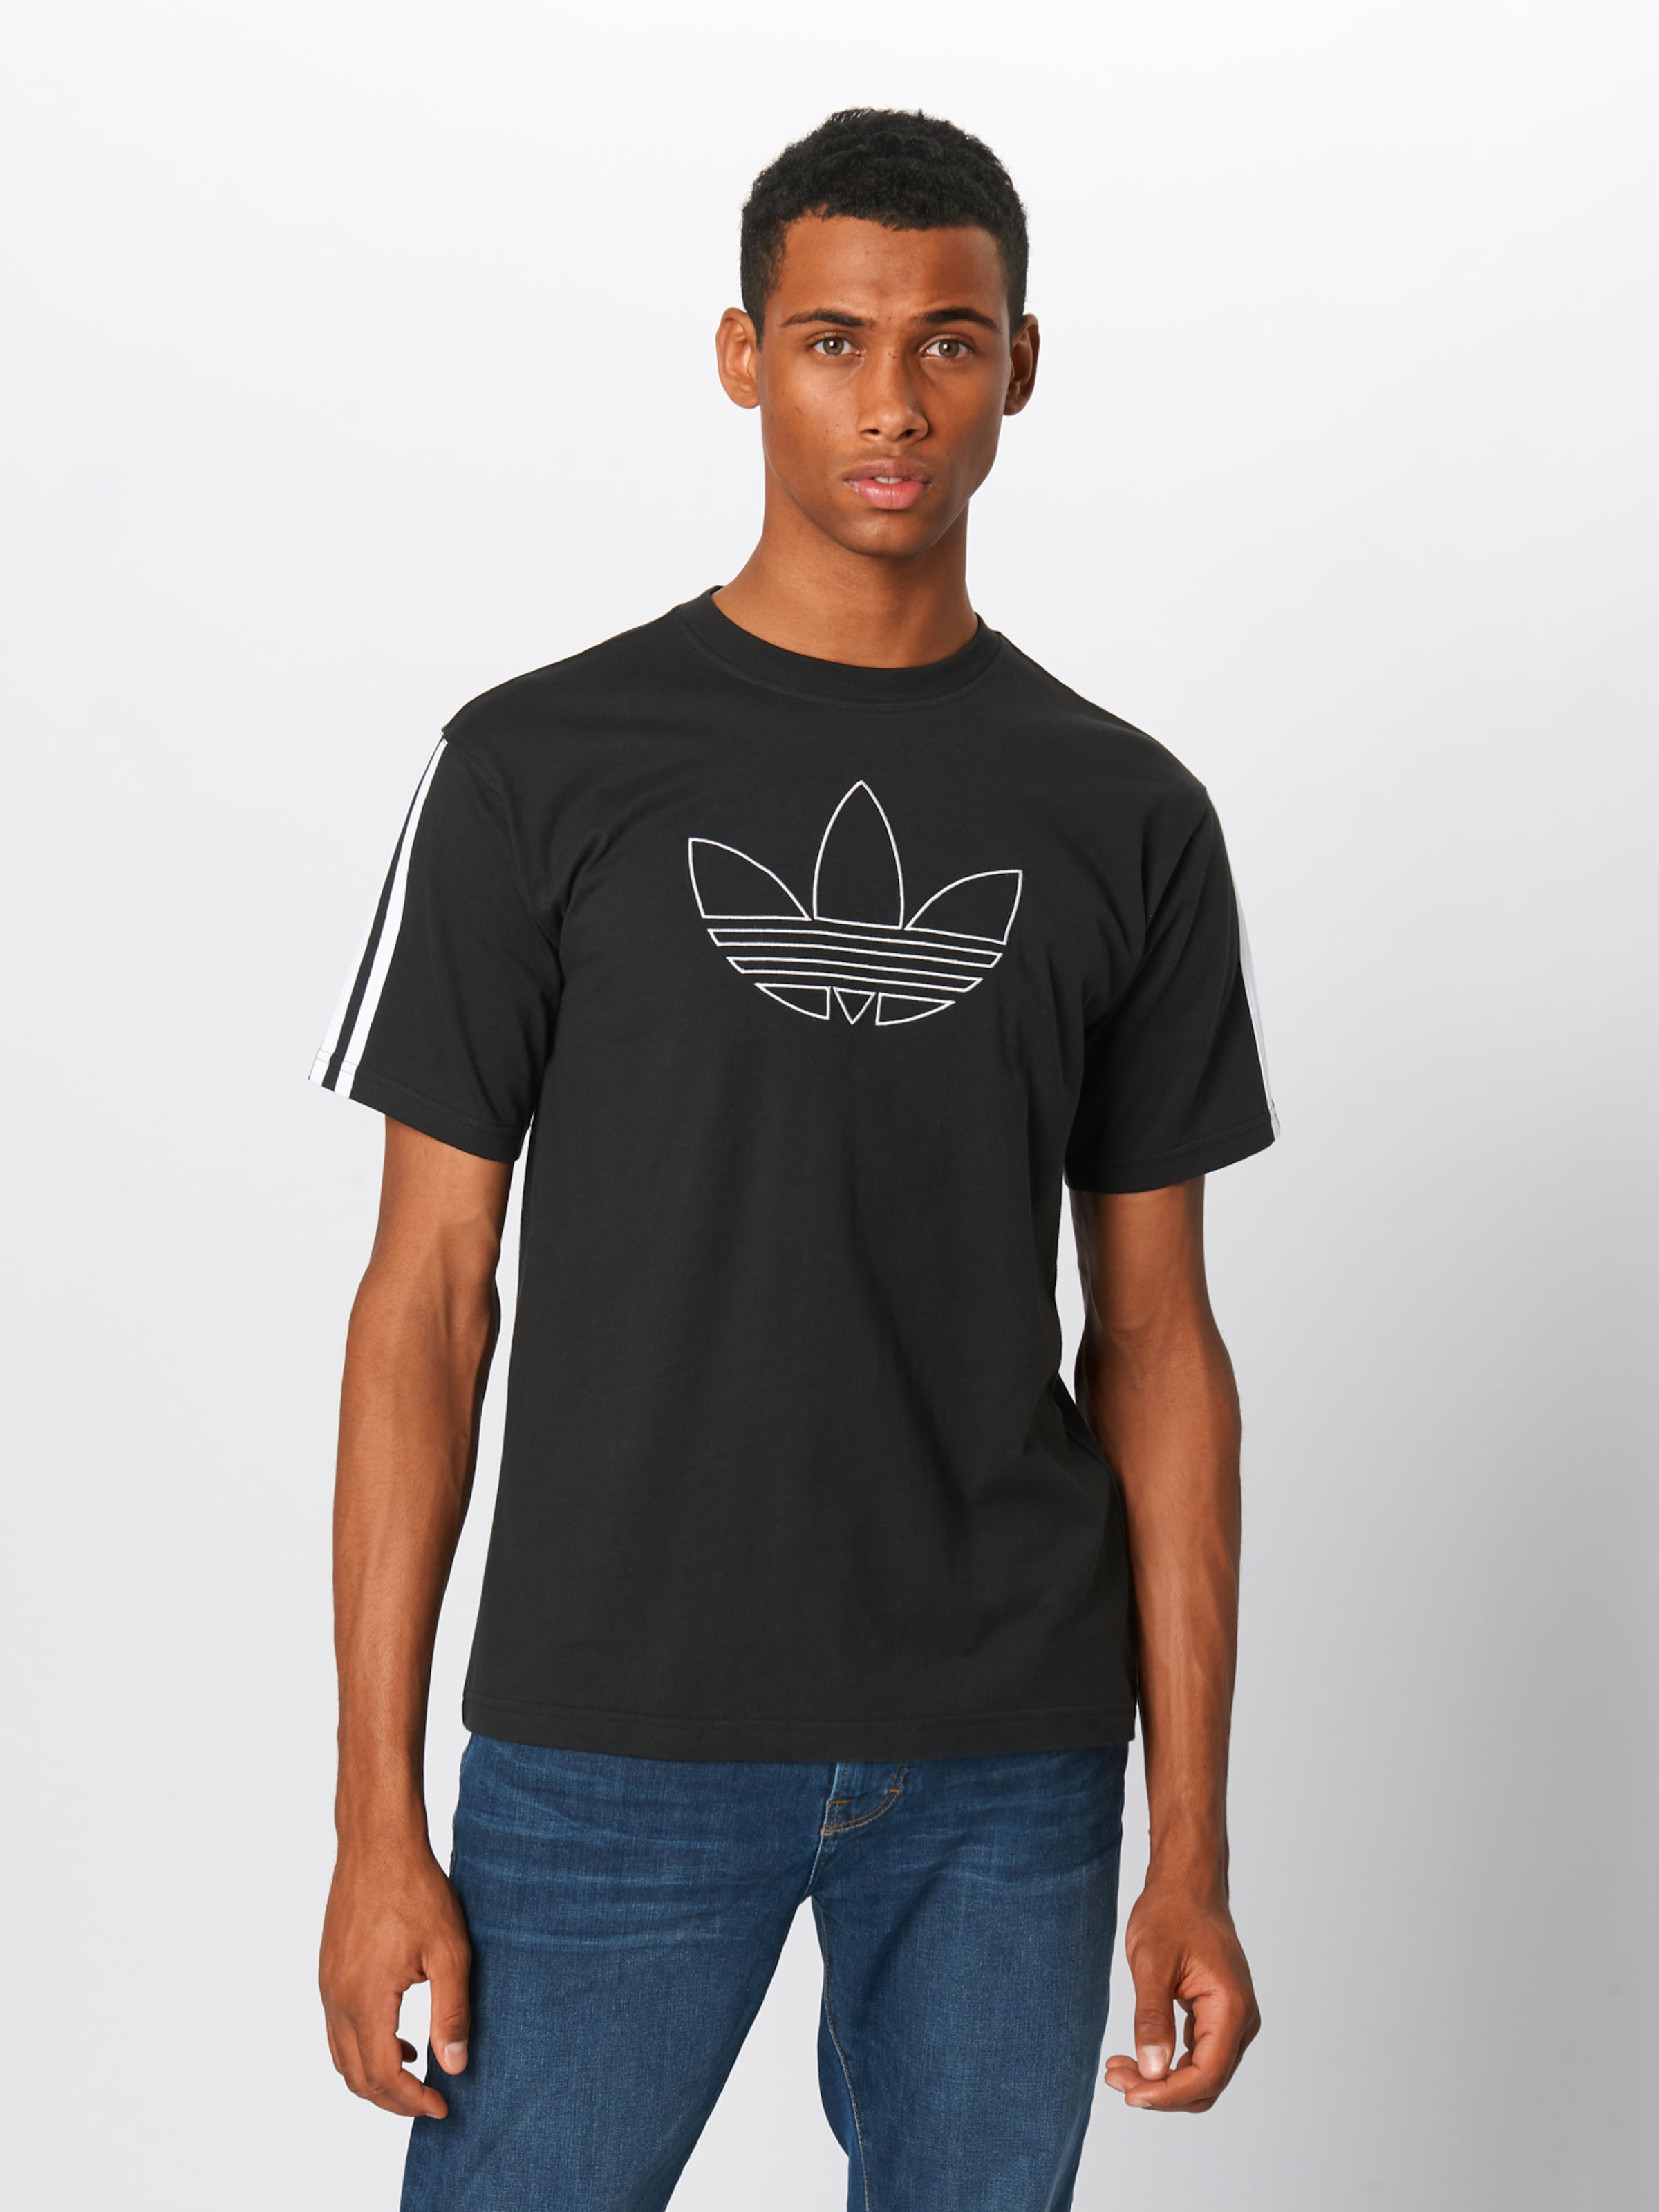 Schwarz In Shirt Adidas Originals Adidas Shirt Originals dBshQCtrx